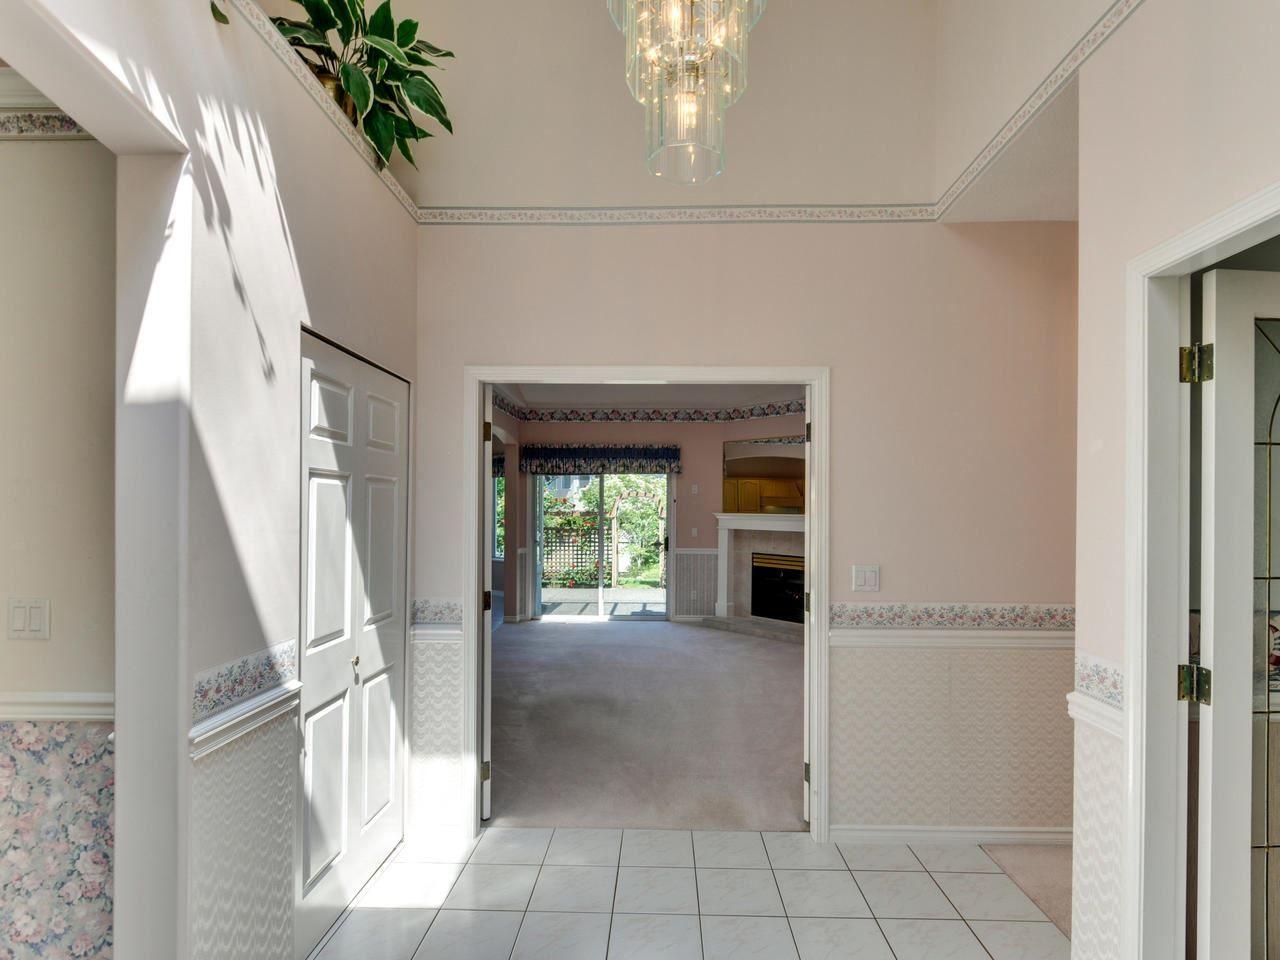 "Photo 2: Photos: 14923 24A Avenue in Surrey: Sunnyside Park Surrey House for sale in ""Sherborrke Estates"" (South Surrey White Rock)  : MLS®# R2374300"